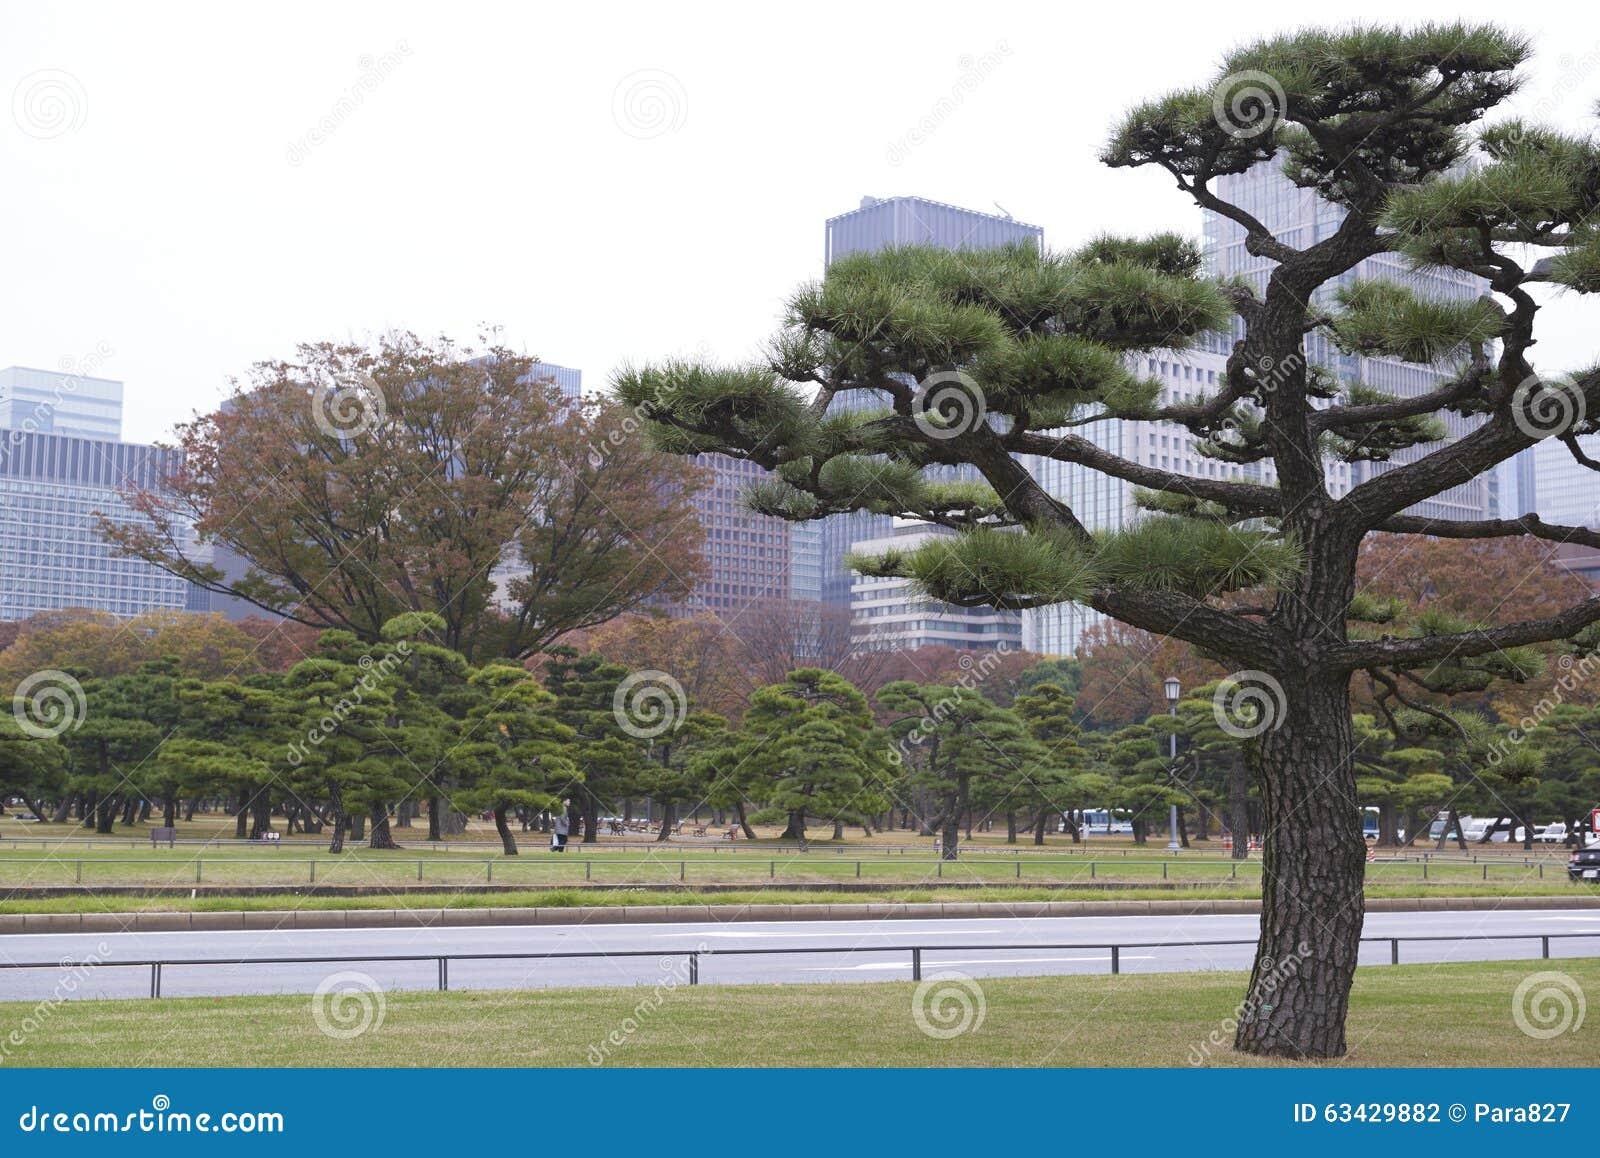 Imperial palace outer garden stock photo image 63429882 for Outer garden